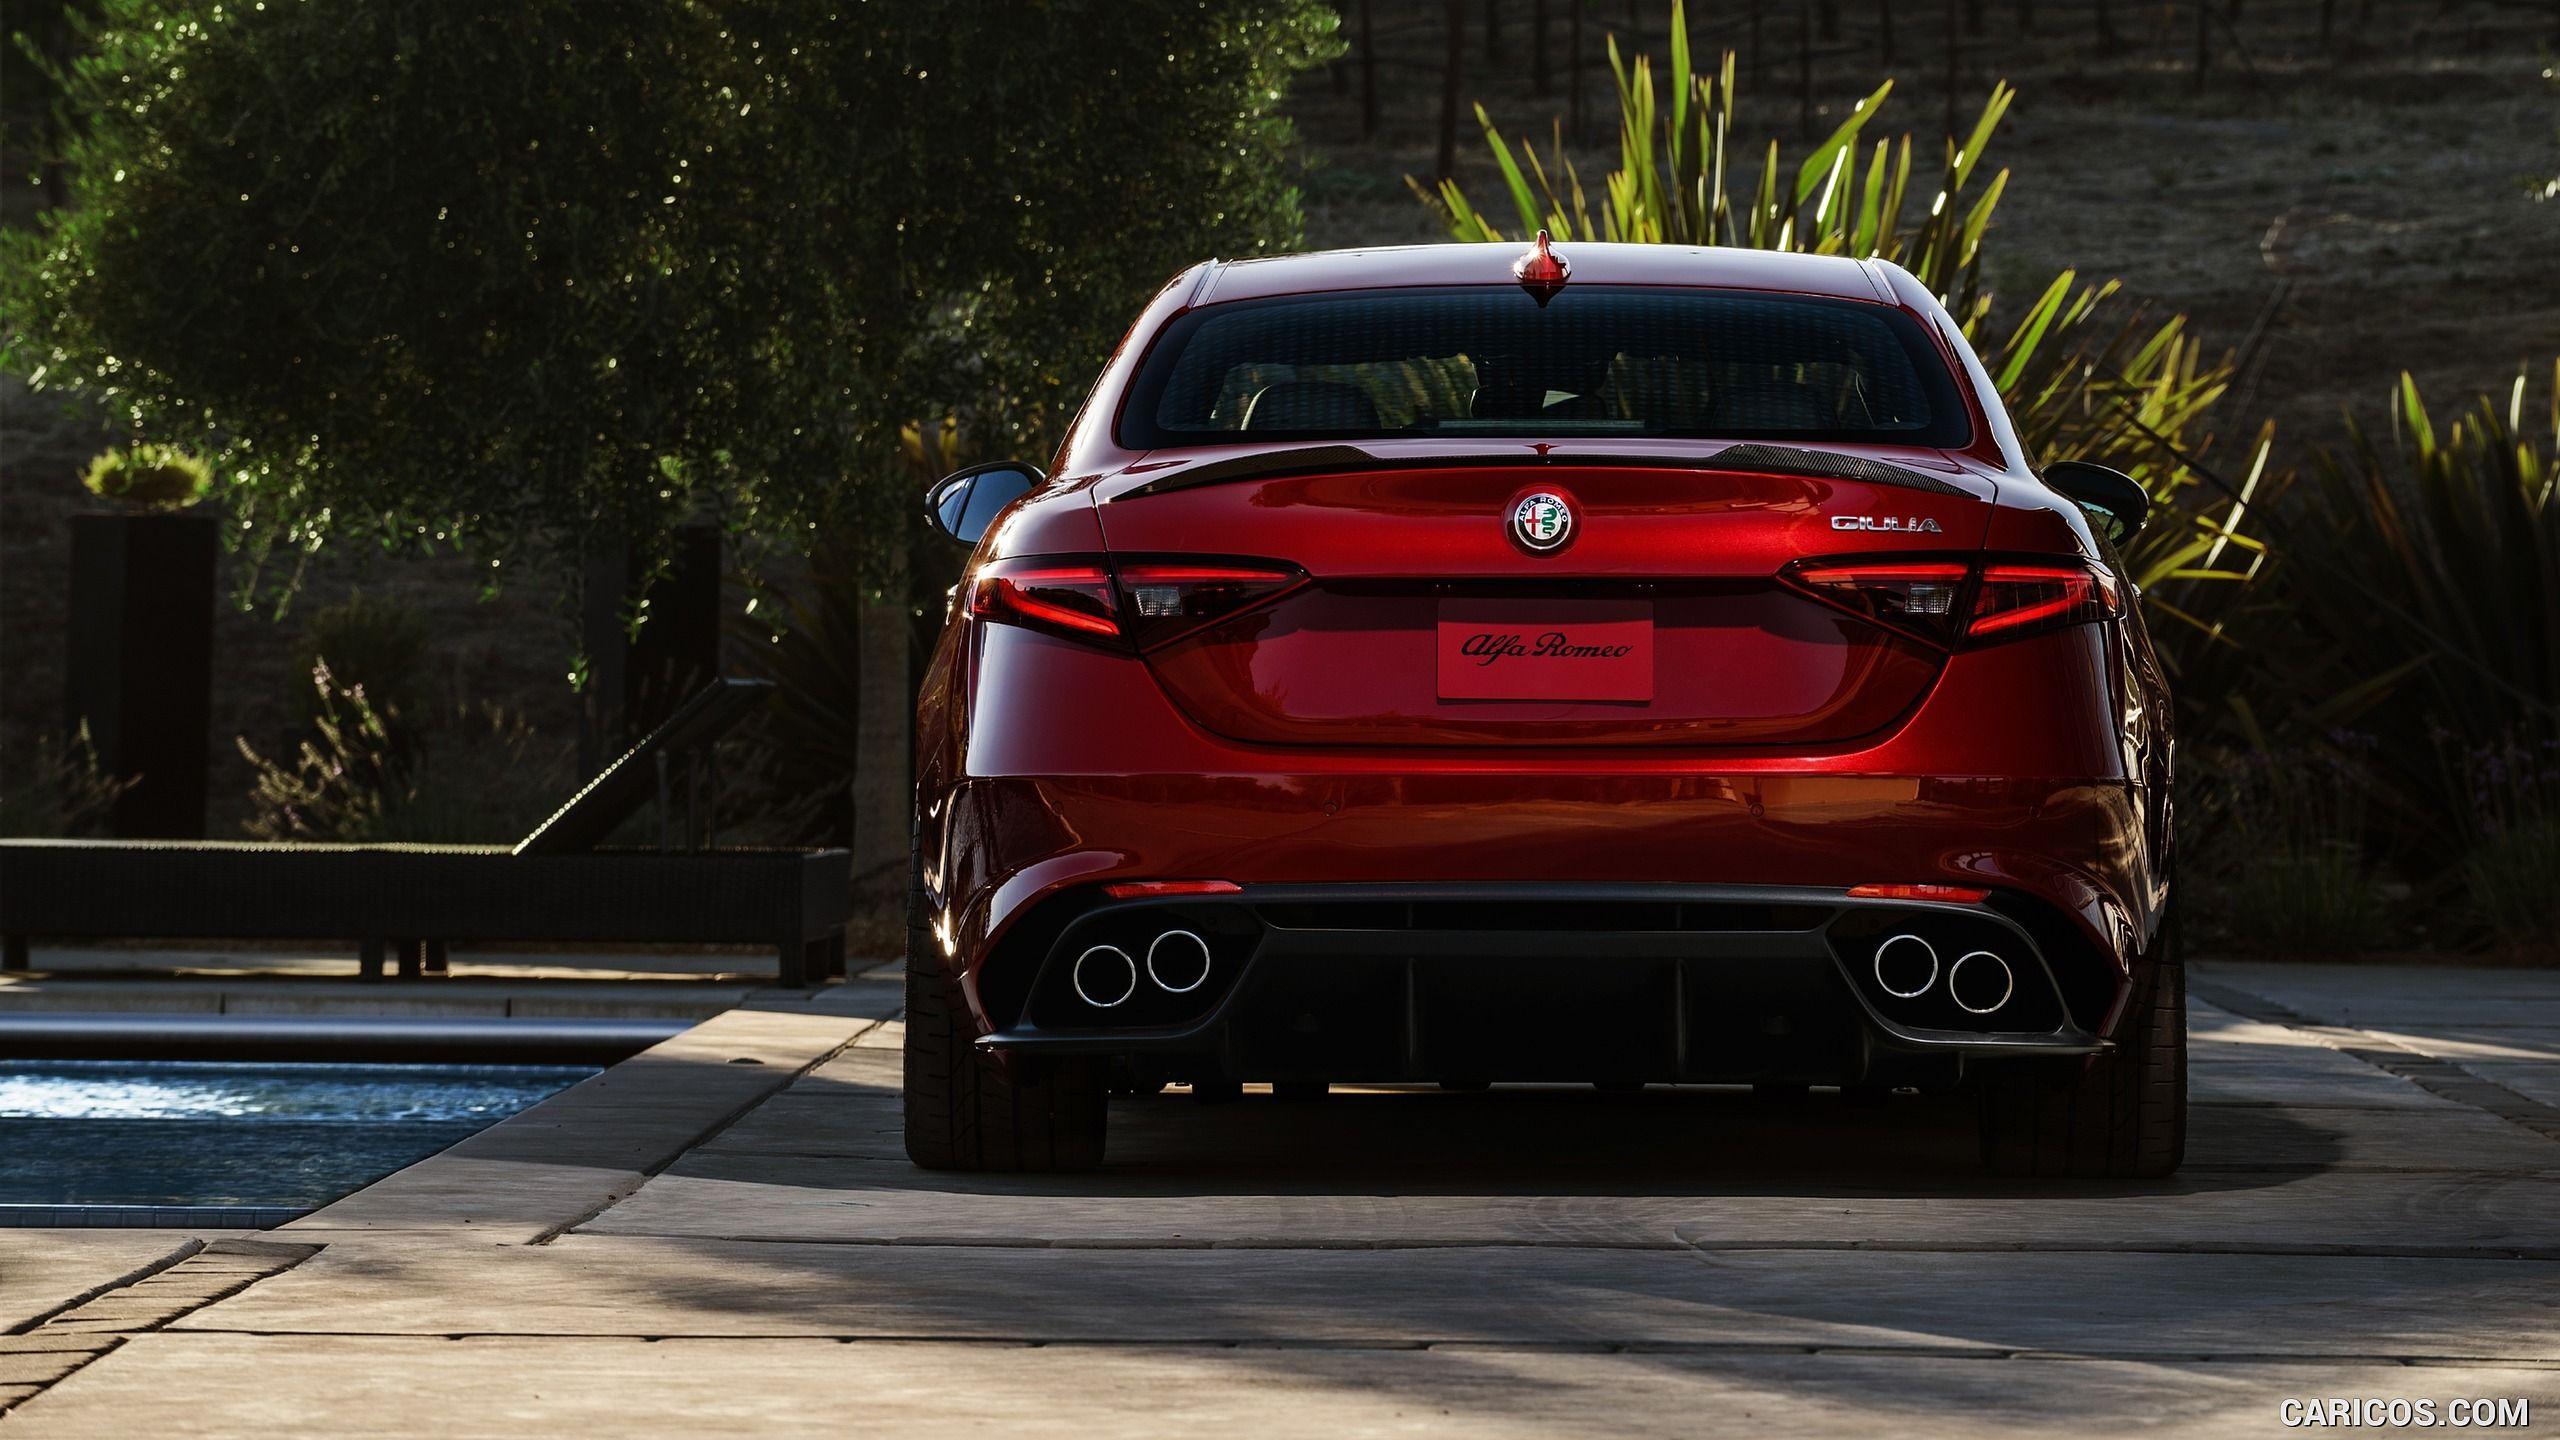 2017 Alfa Romeo Giulia Quadrifoglio Wallpaper Alfa Romeo Giulia